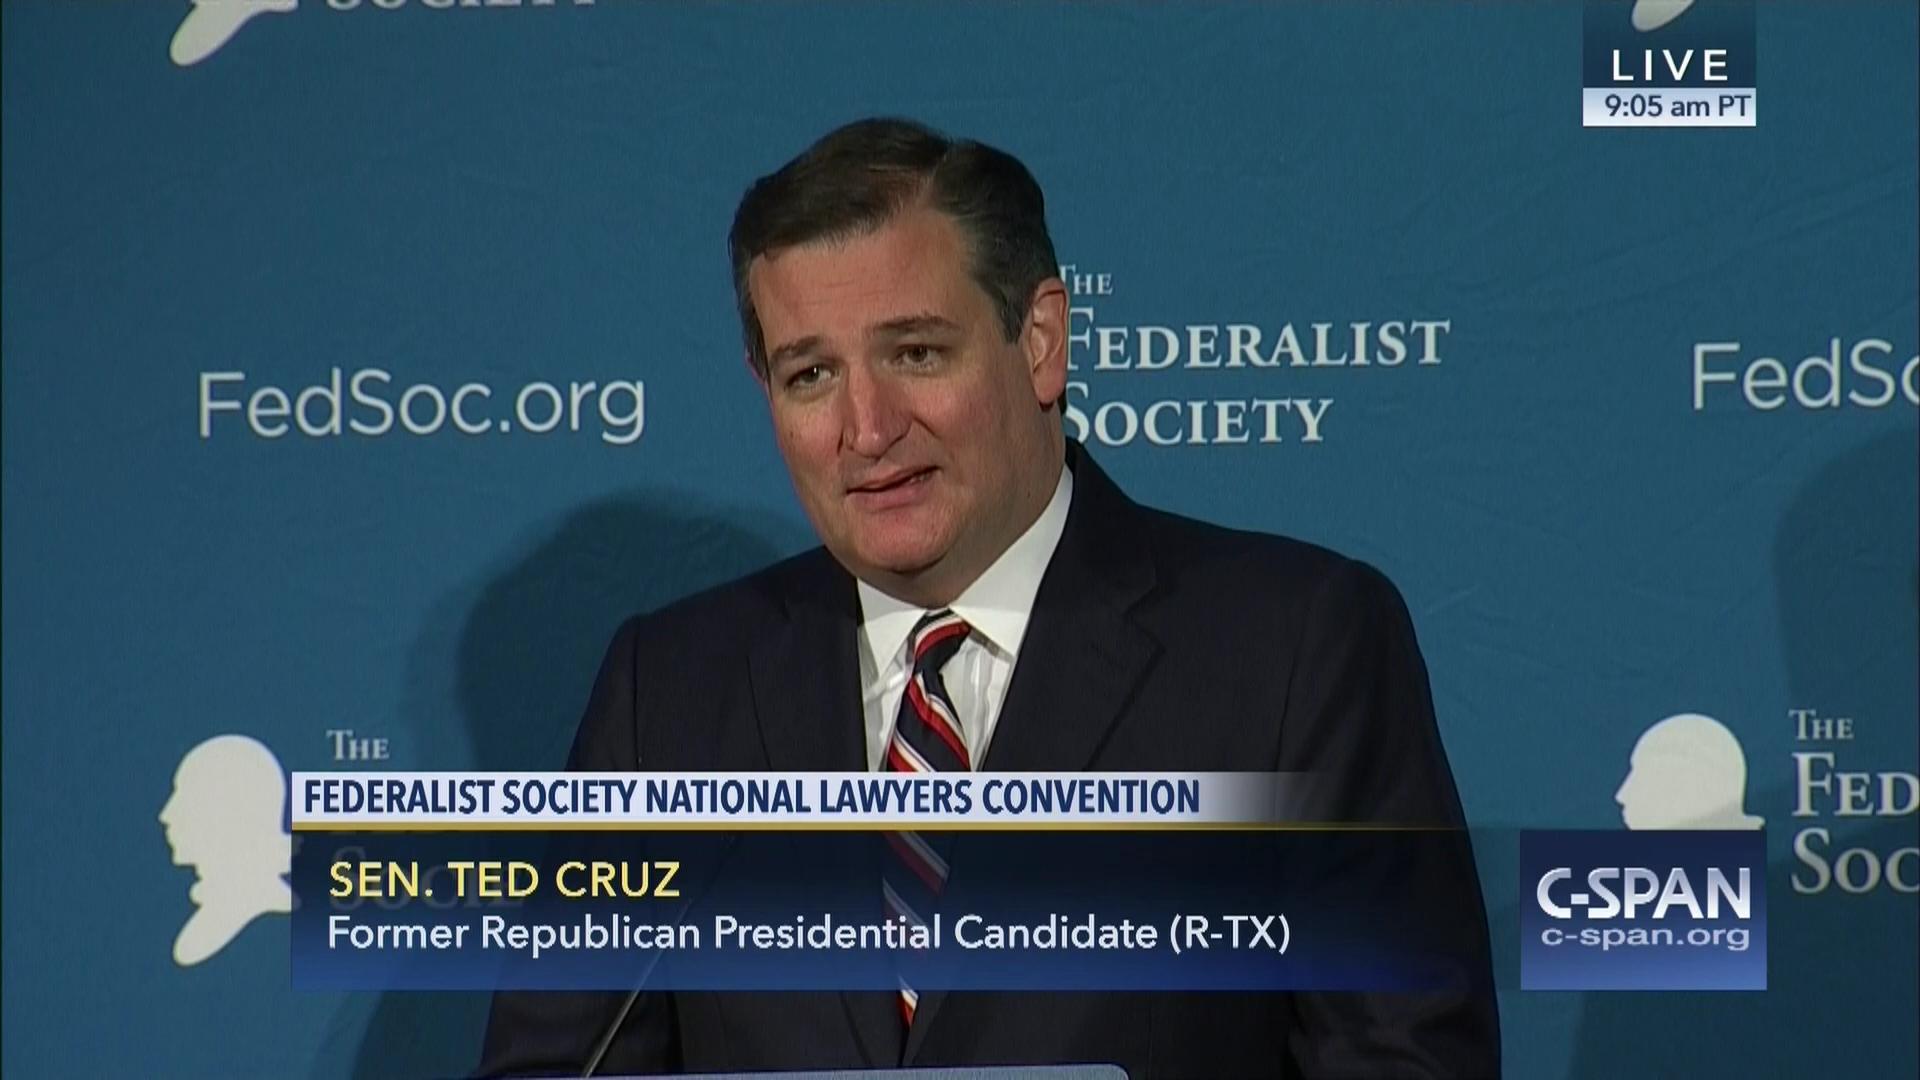 Federalist Society National Lawyers Convention Senator Cruz, Nov 18 2016